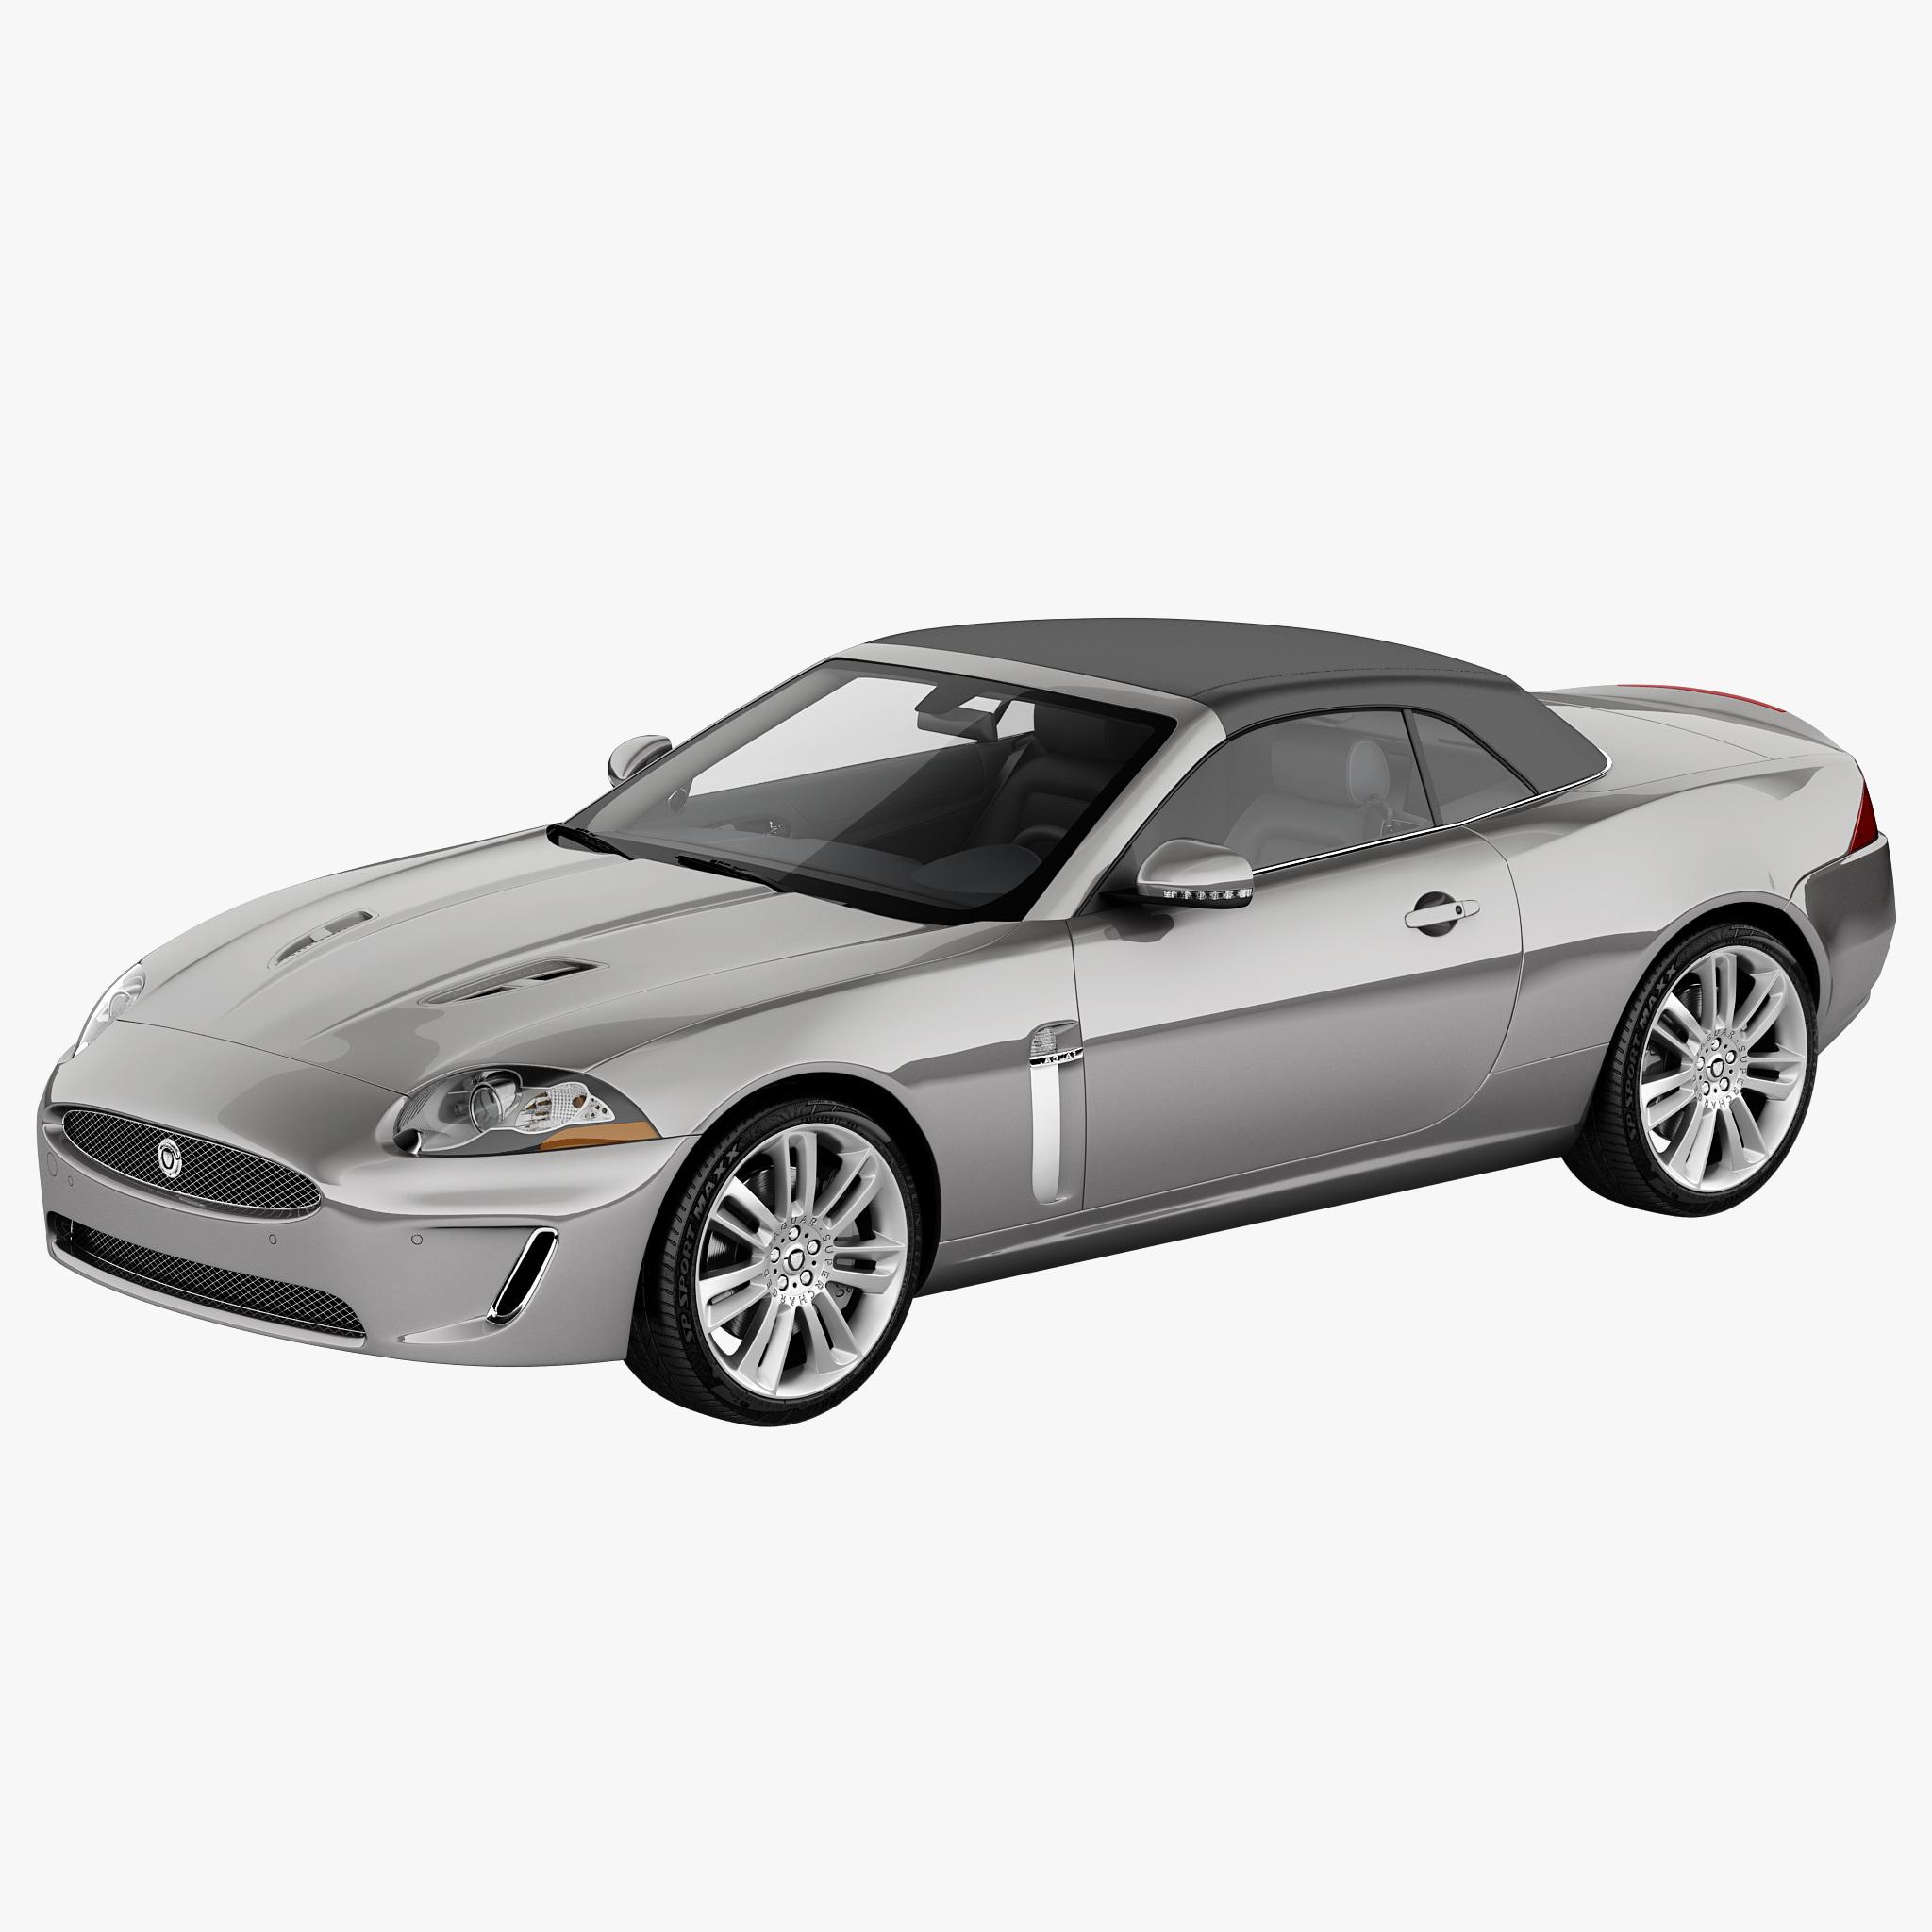 Jaguar Xk Convertible: Xkr Convertible 2011 3d Model